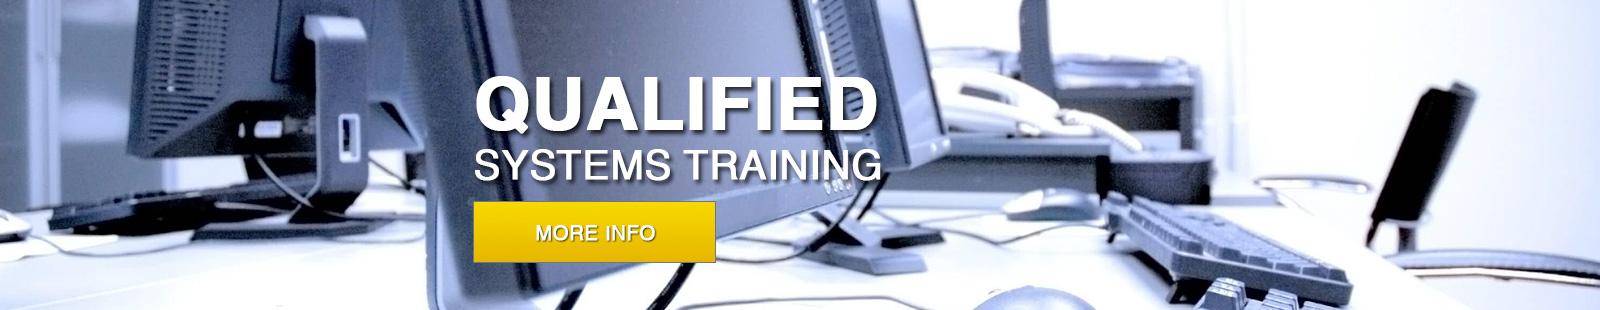 training1119